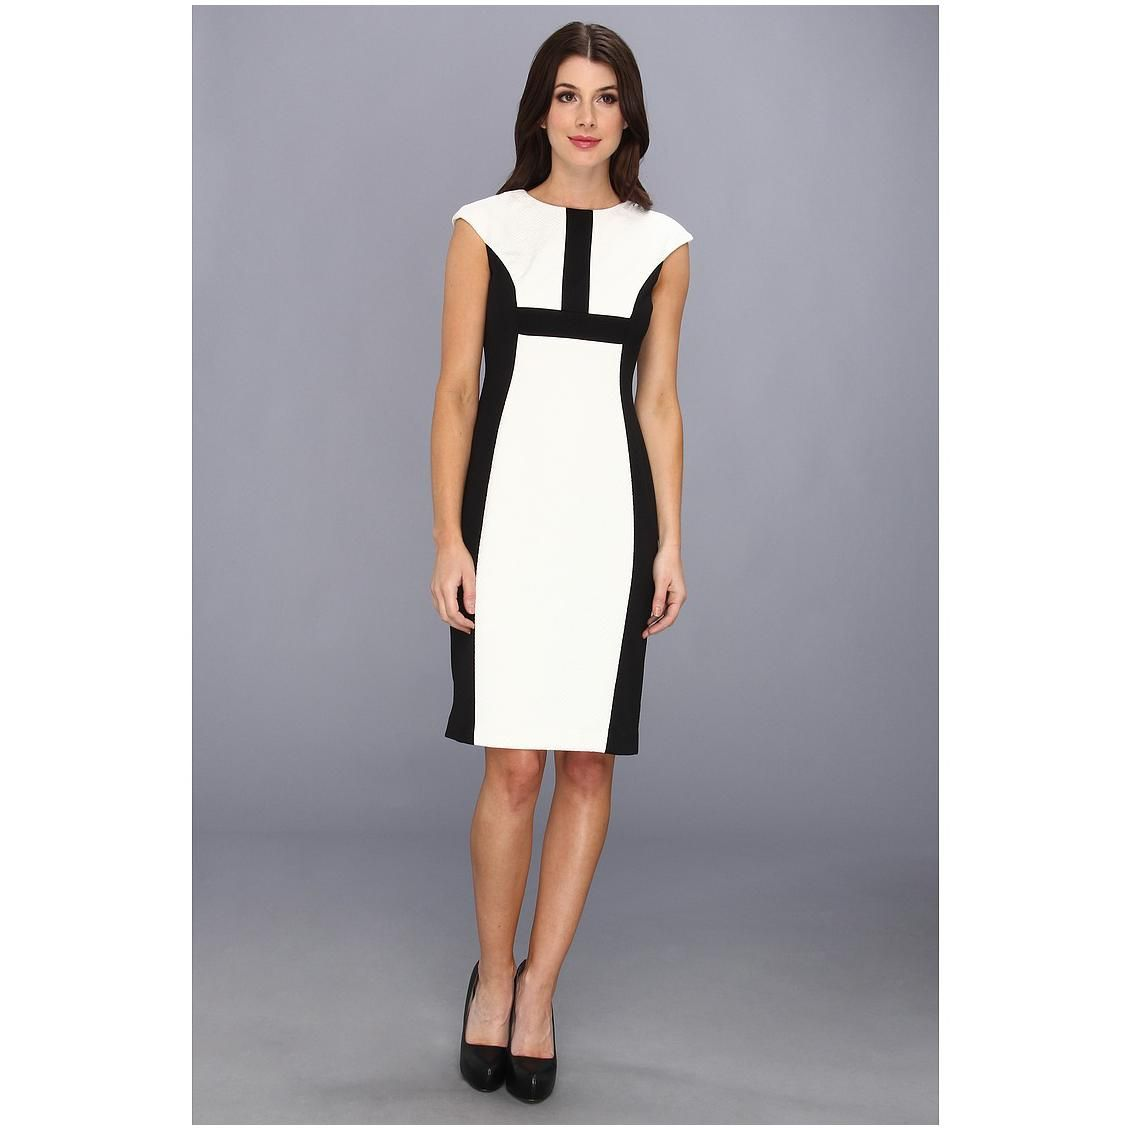 ca2f274da2a Maggy London Women s Cap Sleeve Jacquard Colorblock Dress ...